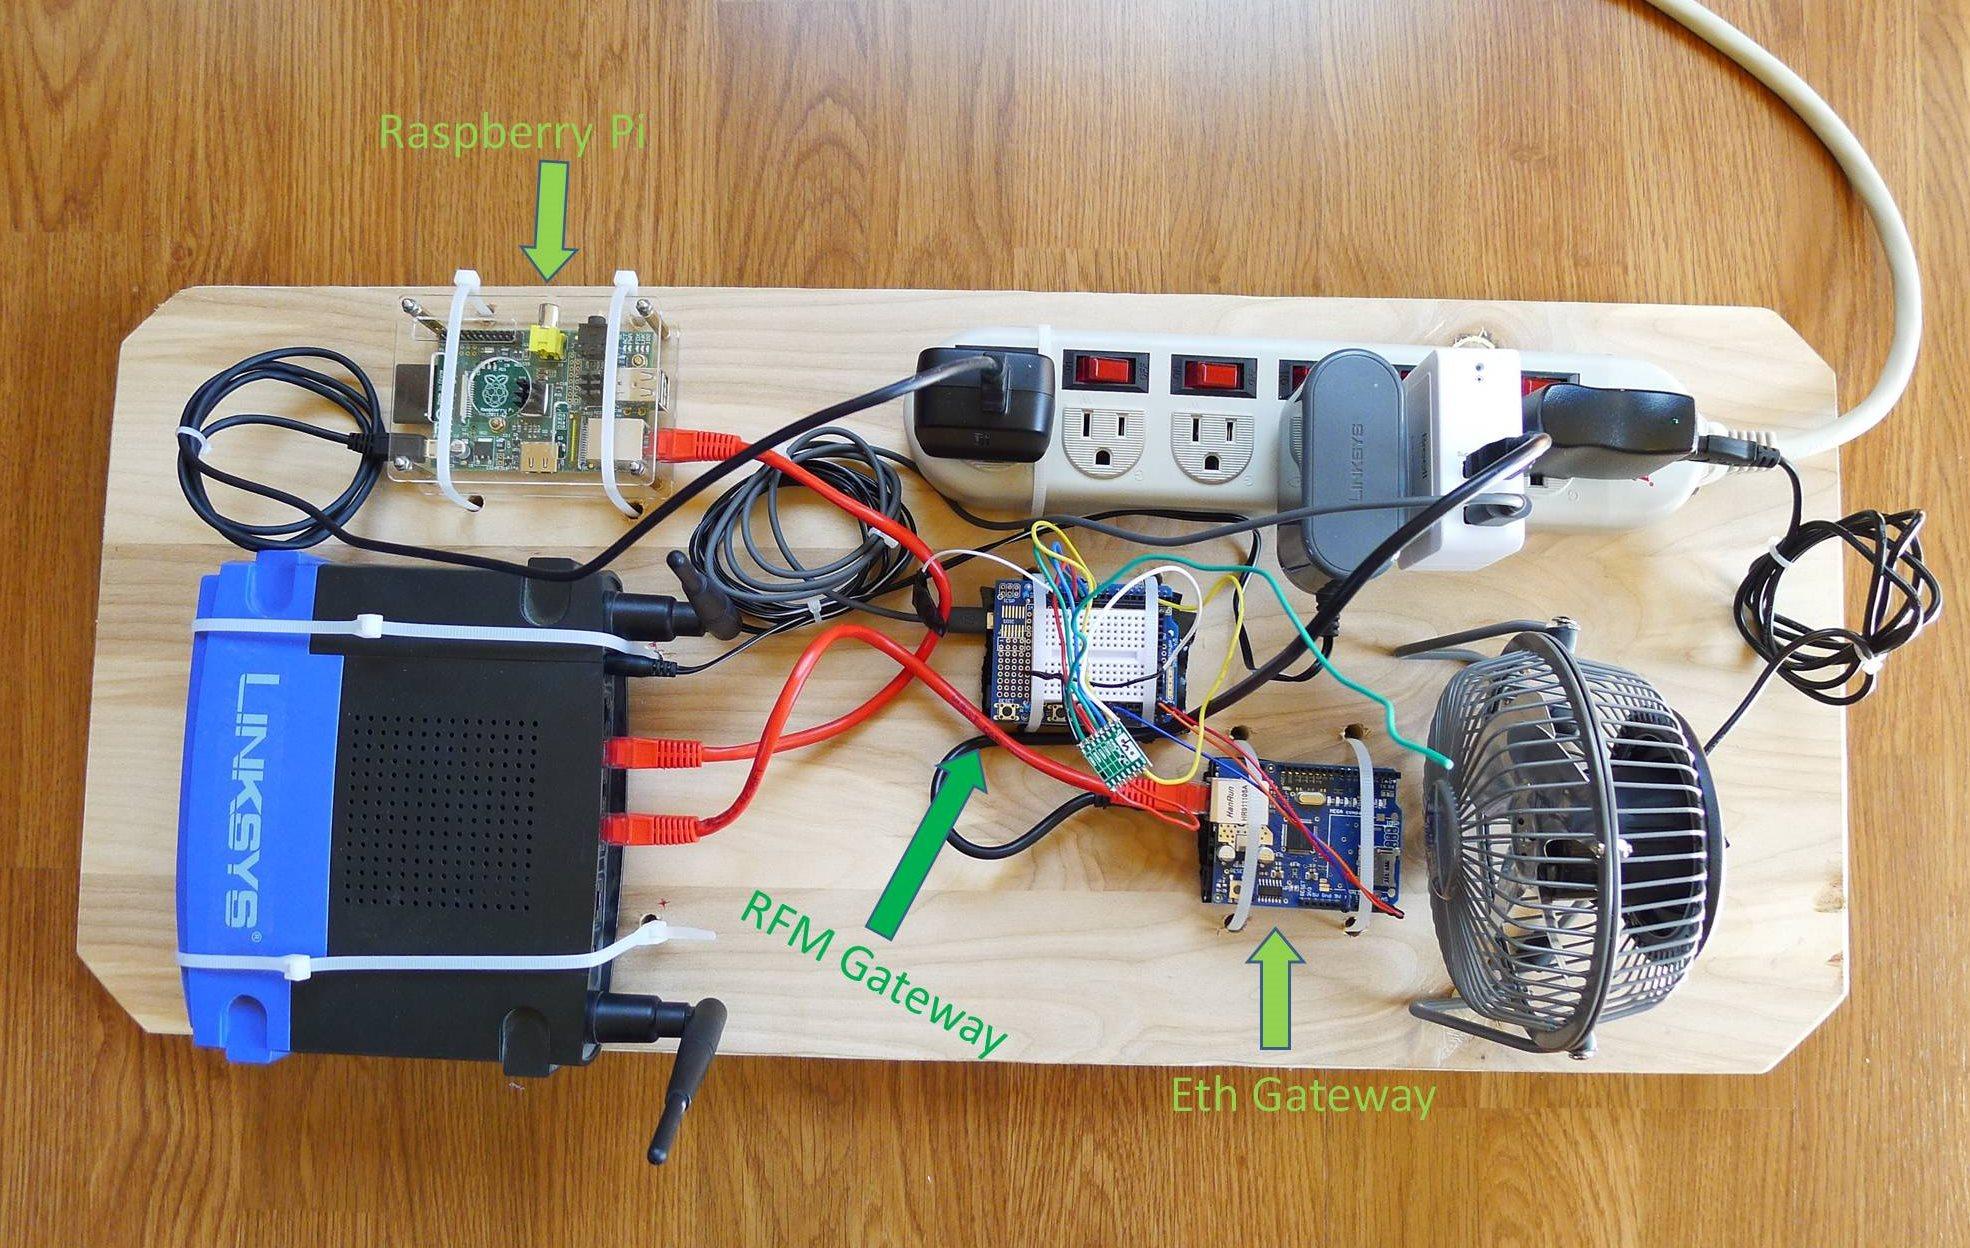 garage door sensor wiring diagram grain kernel uber home automation w/ arduino & pi - 3